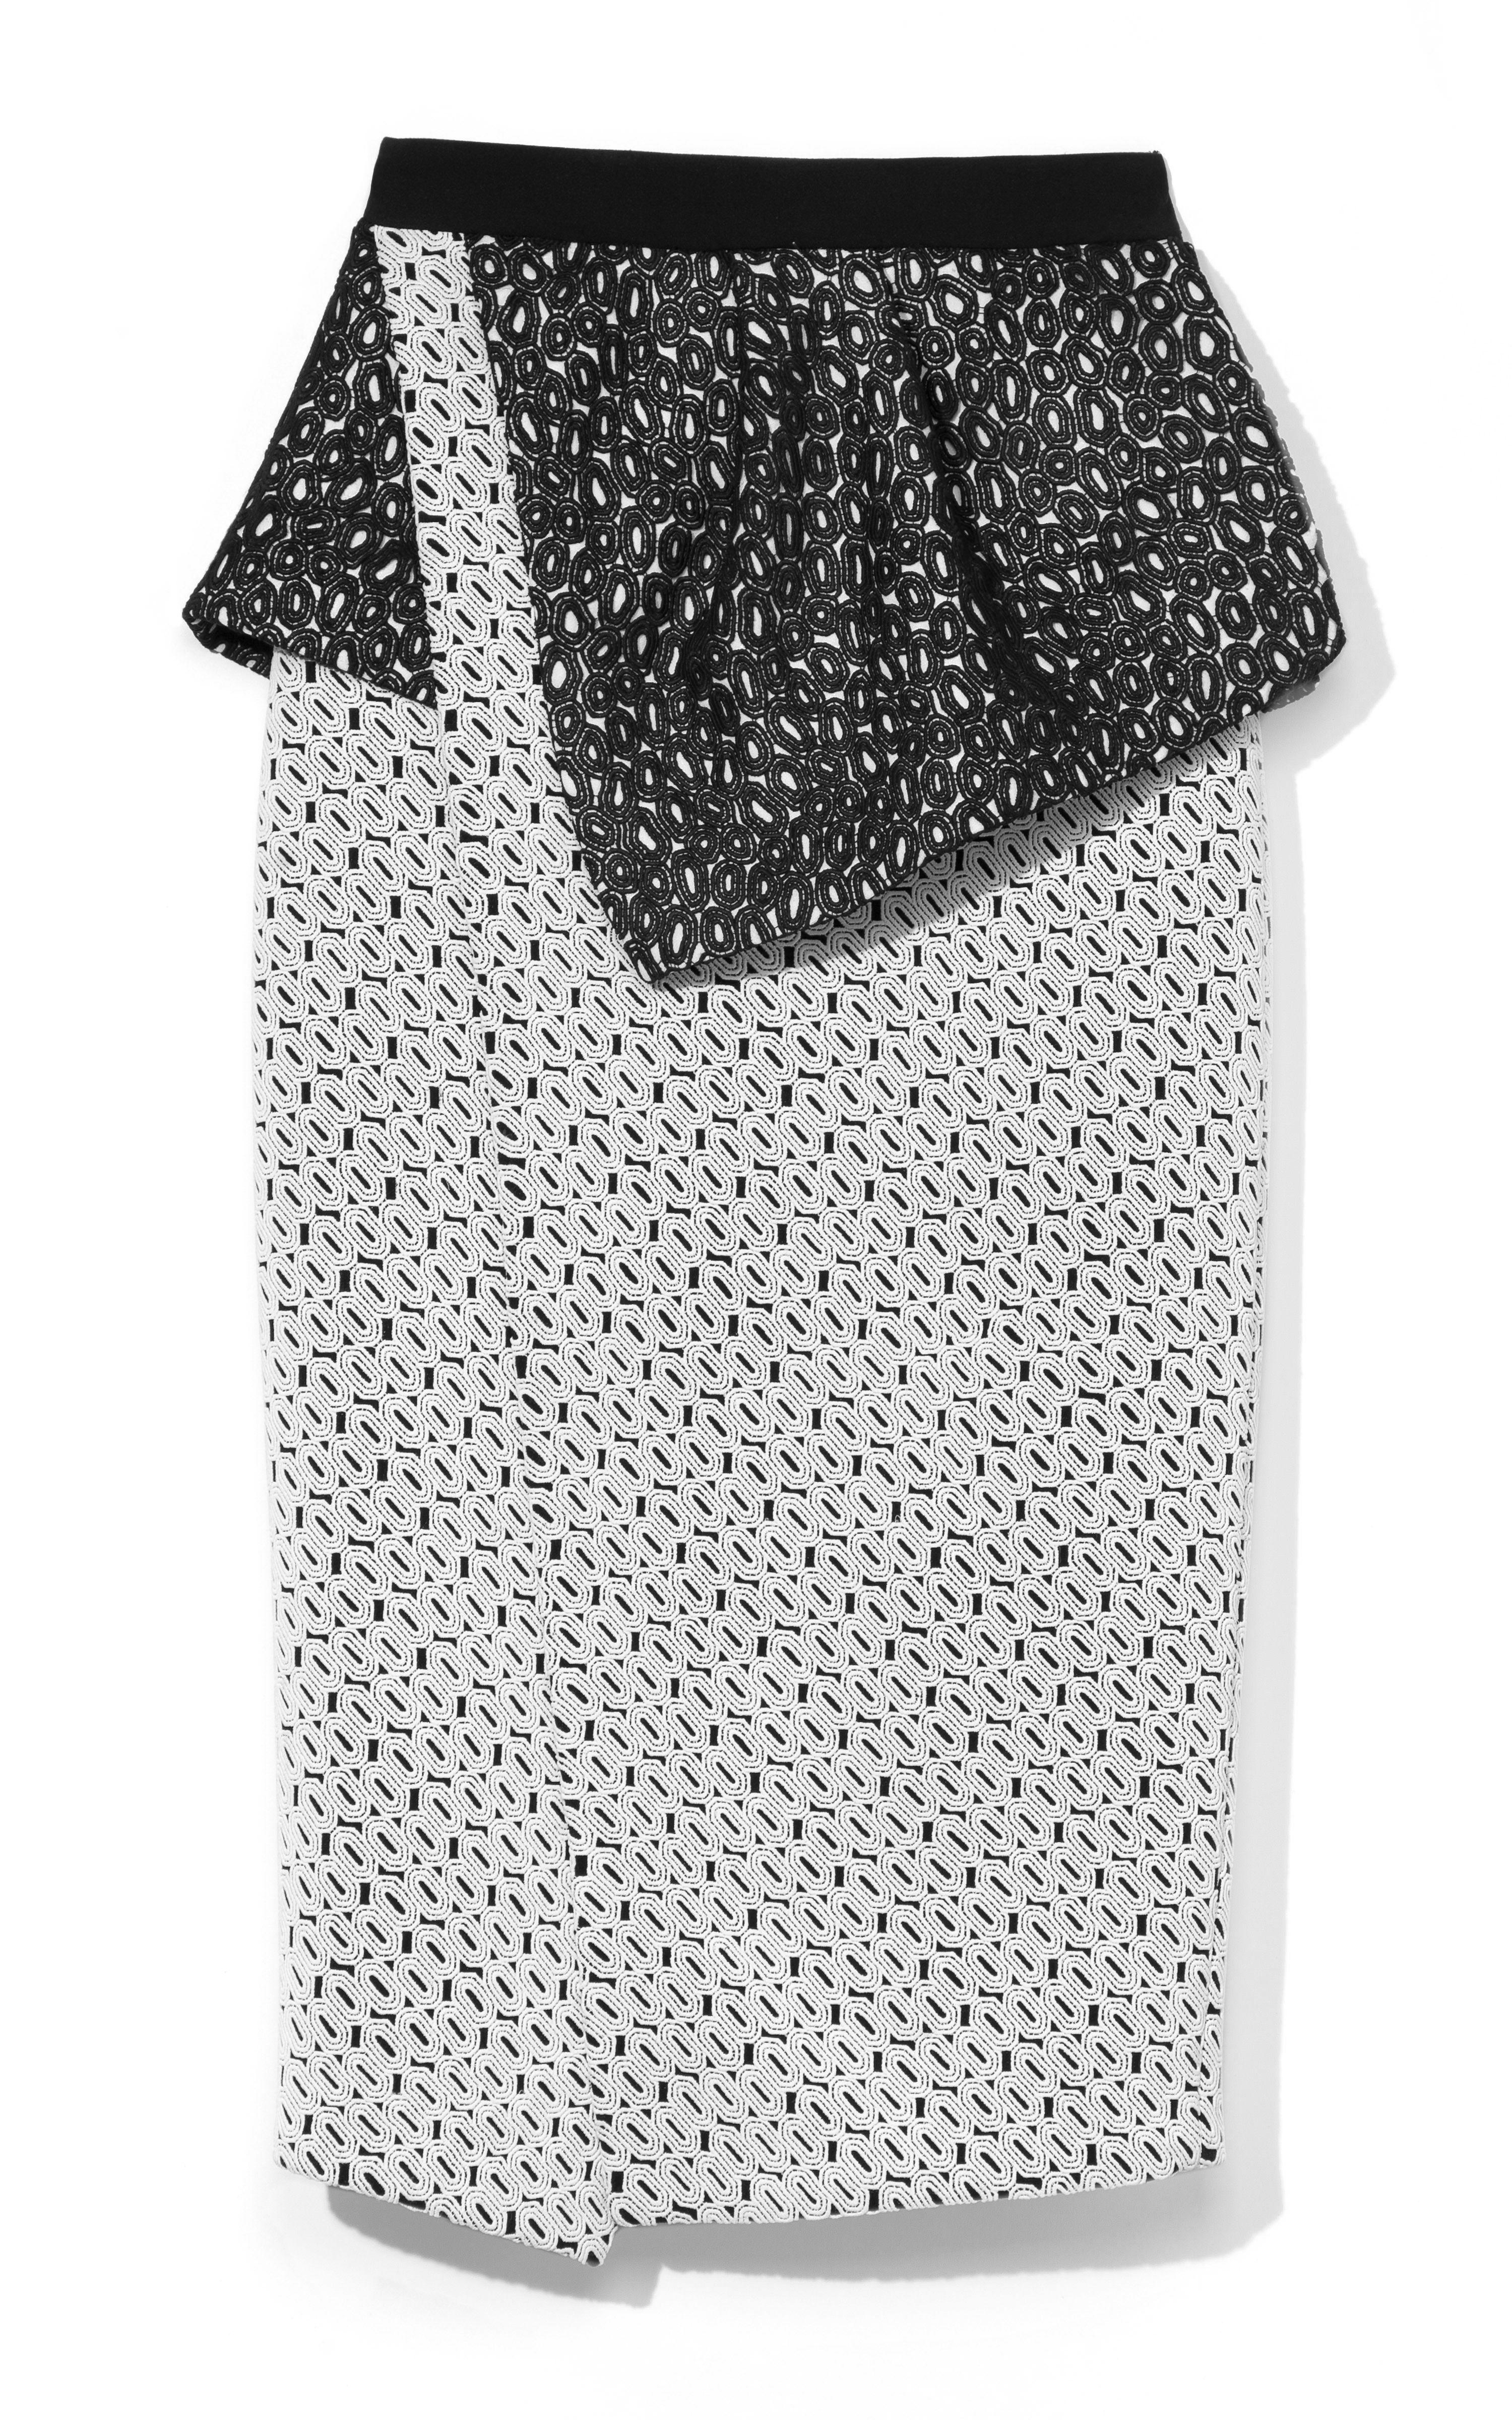 eae1809fec Embroidered Geometric Lace Peplum Skirt by Proenza Schouler - Moda Operandi